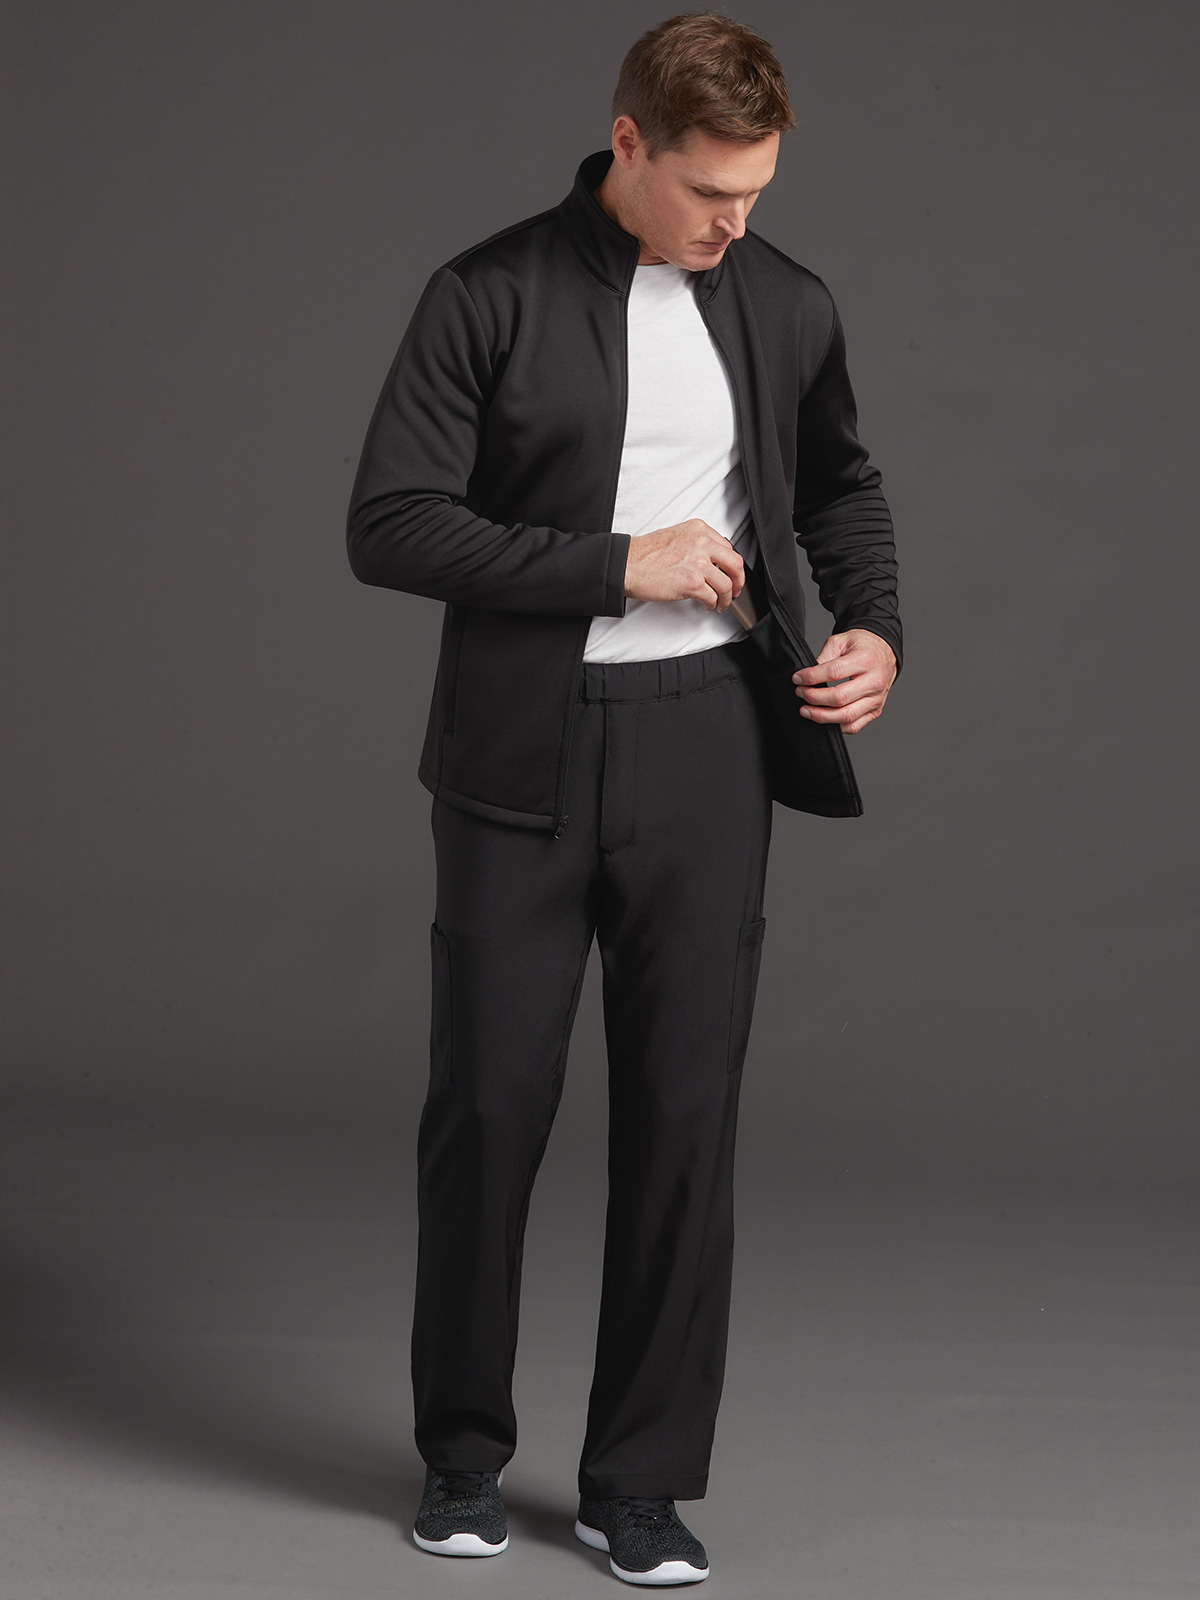 Mens Performance Fleece Jacket - Black - 8688 - Lotts of ...